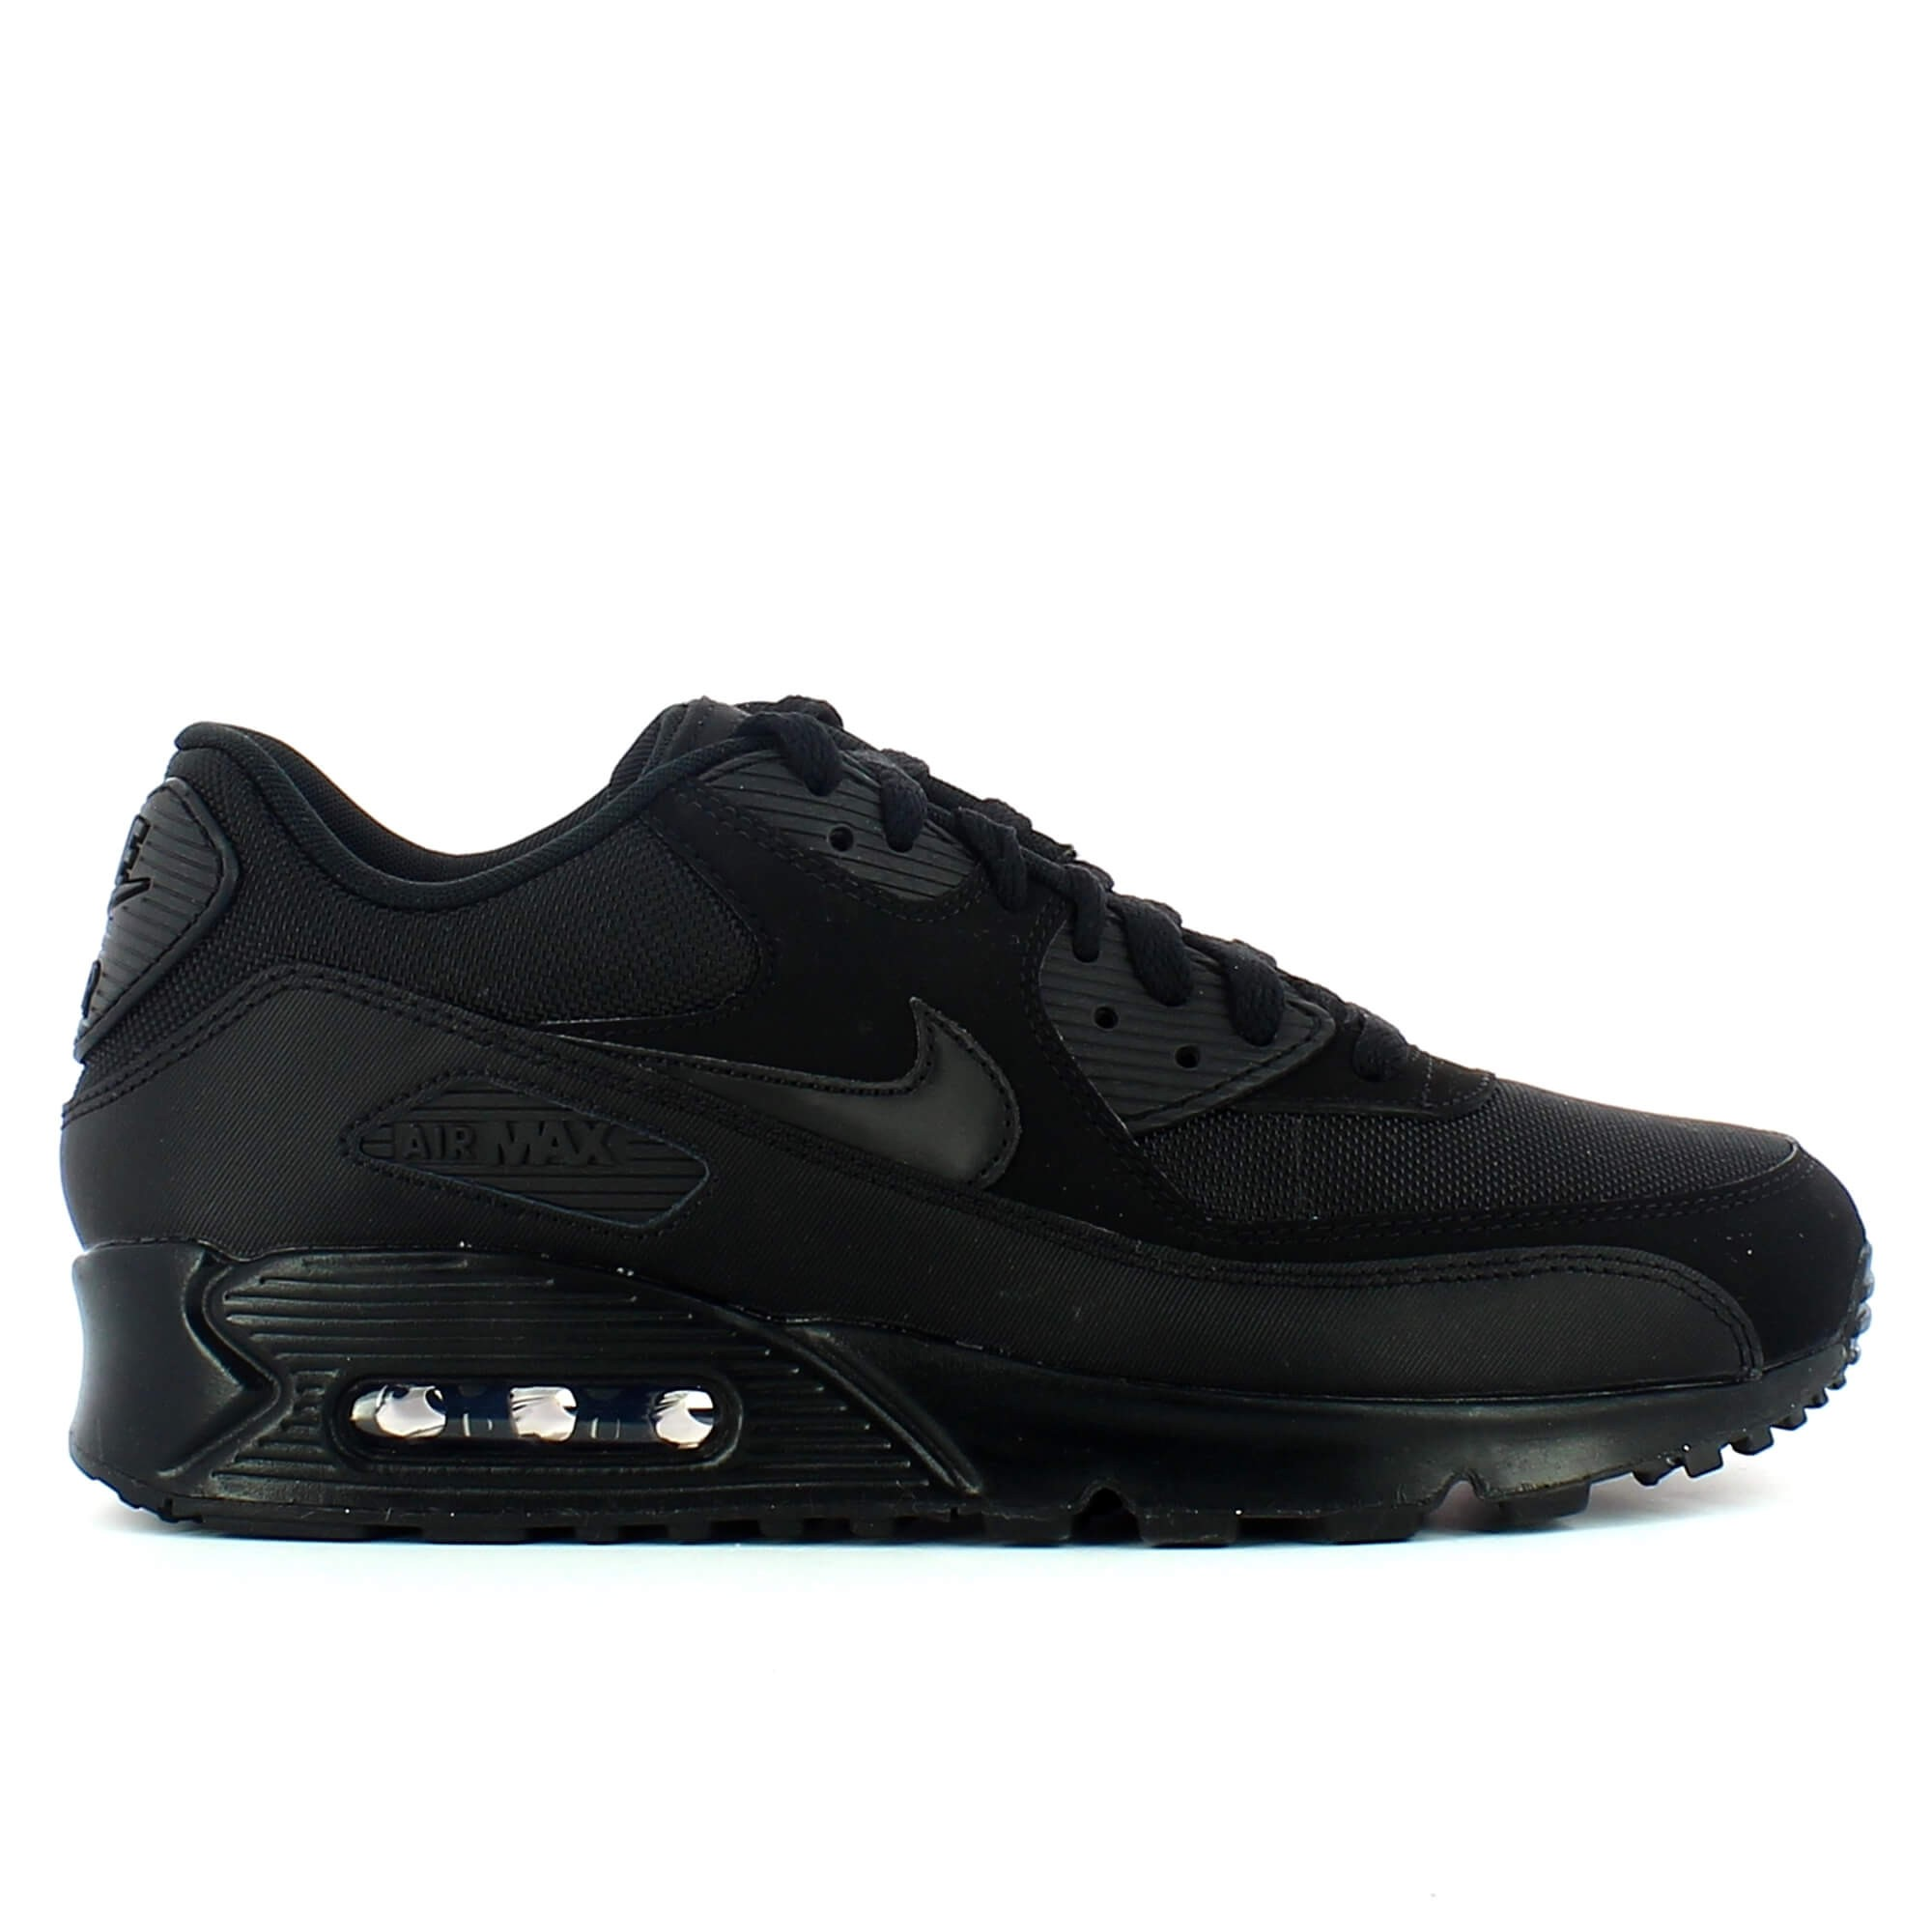 Zapatillas Nike Air Max 90 Essential negro negro hombre ...